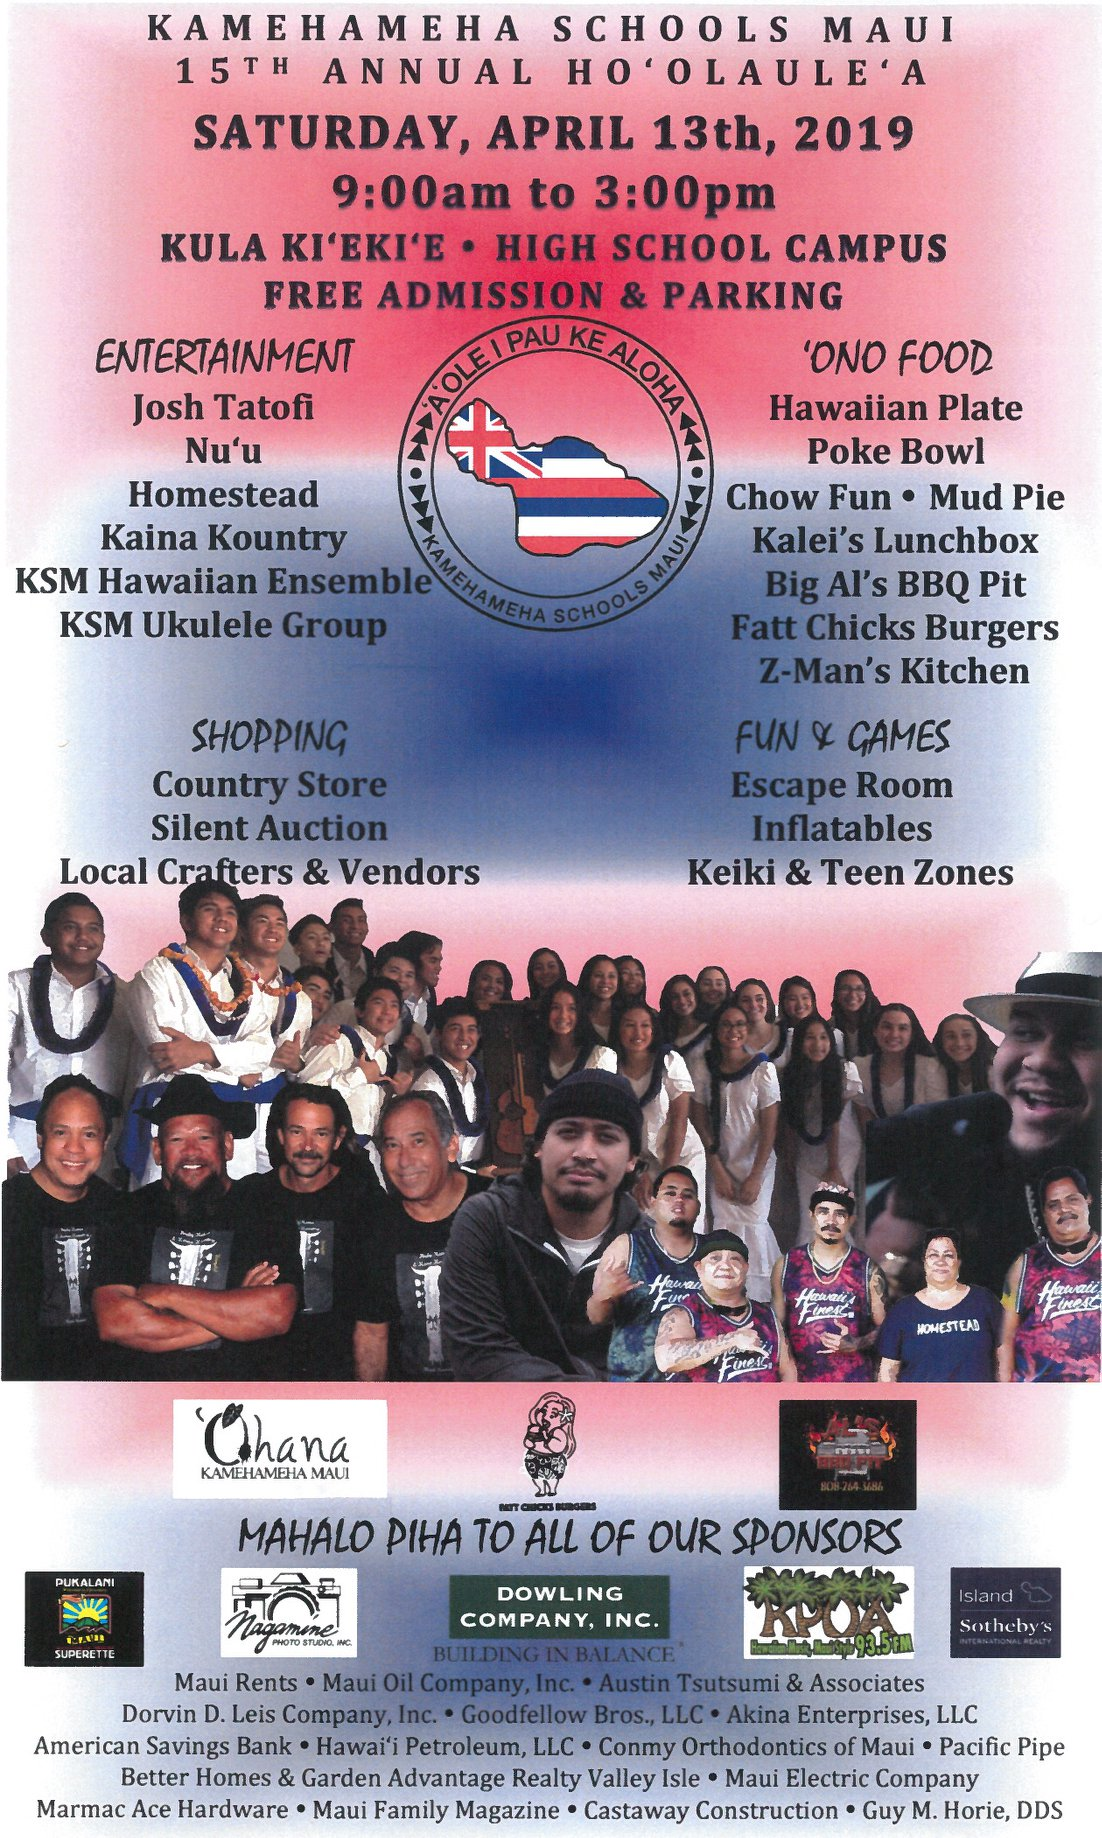 15th Annual Kamehameha Schools Maui Ho'olaule'a